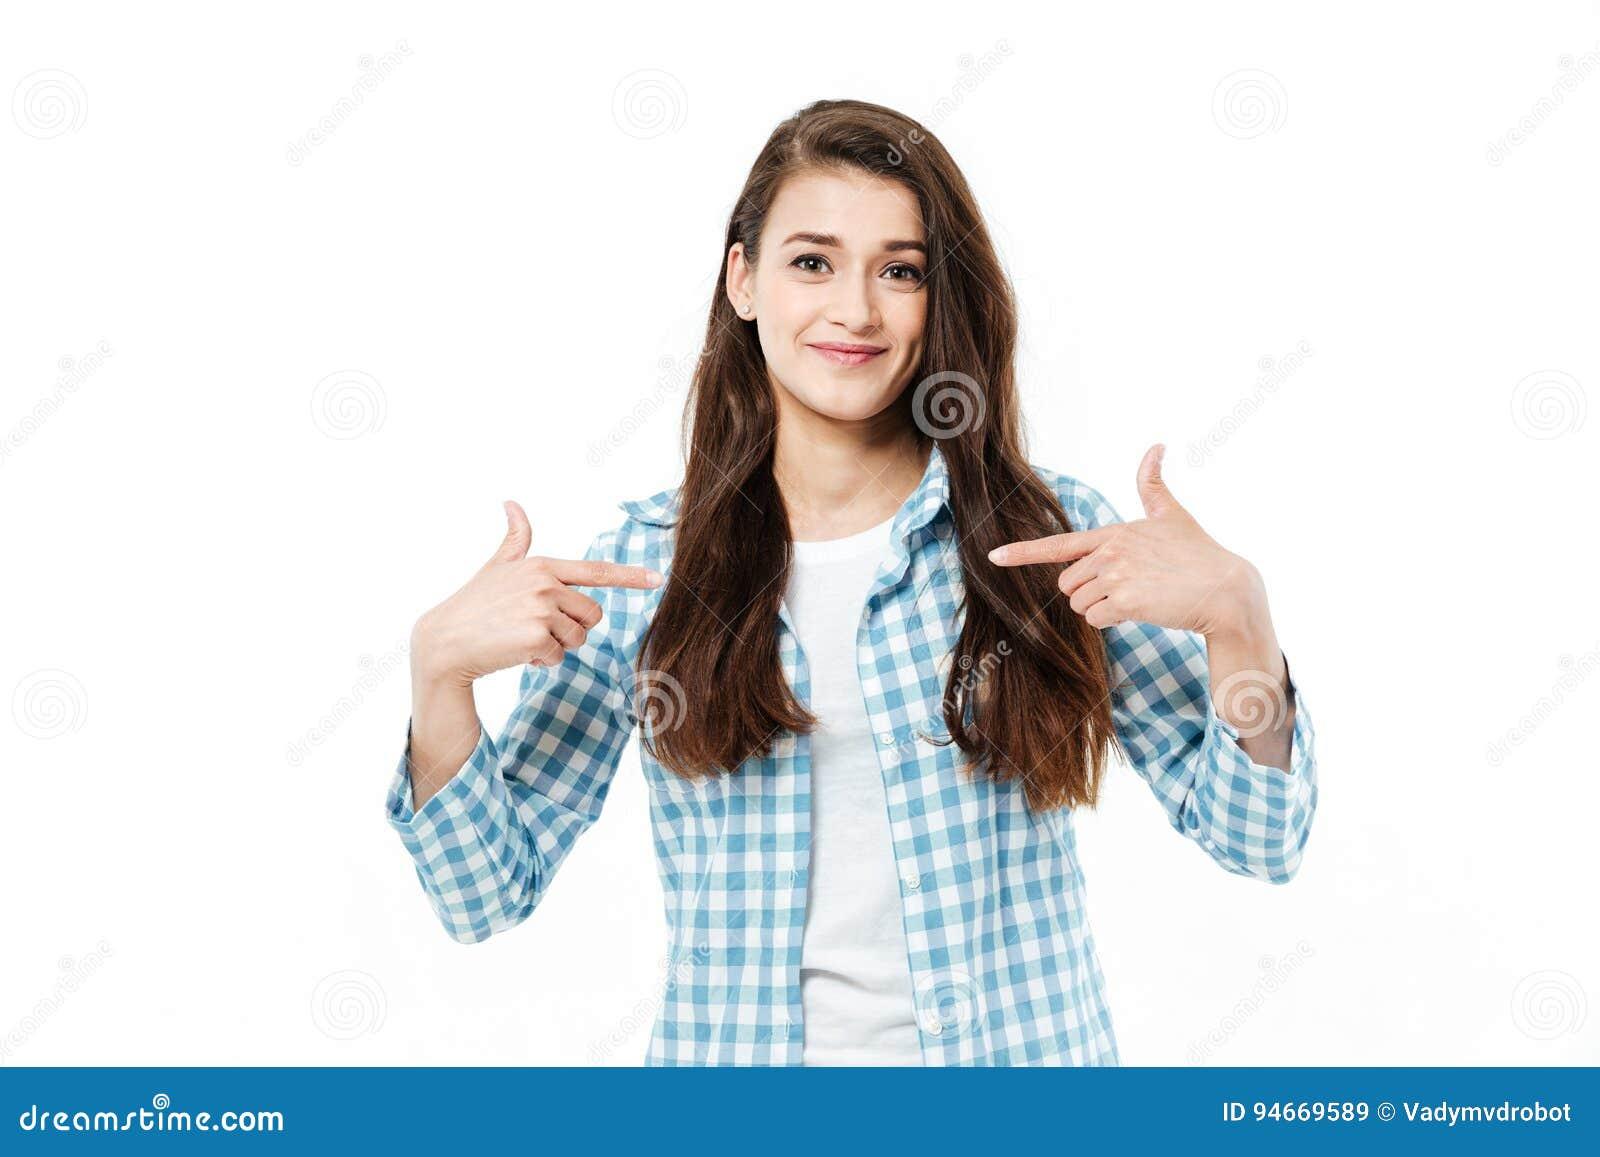 Girl fingers herself